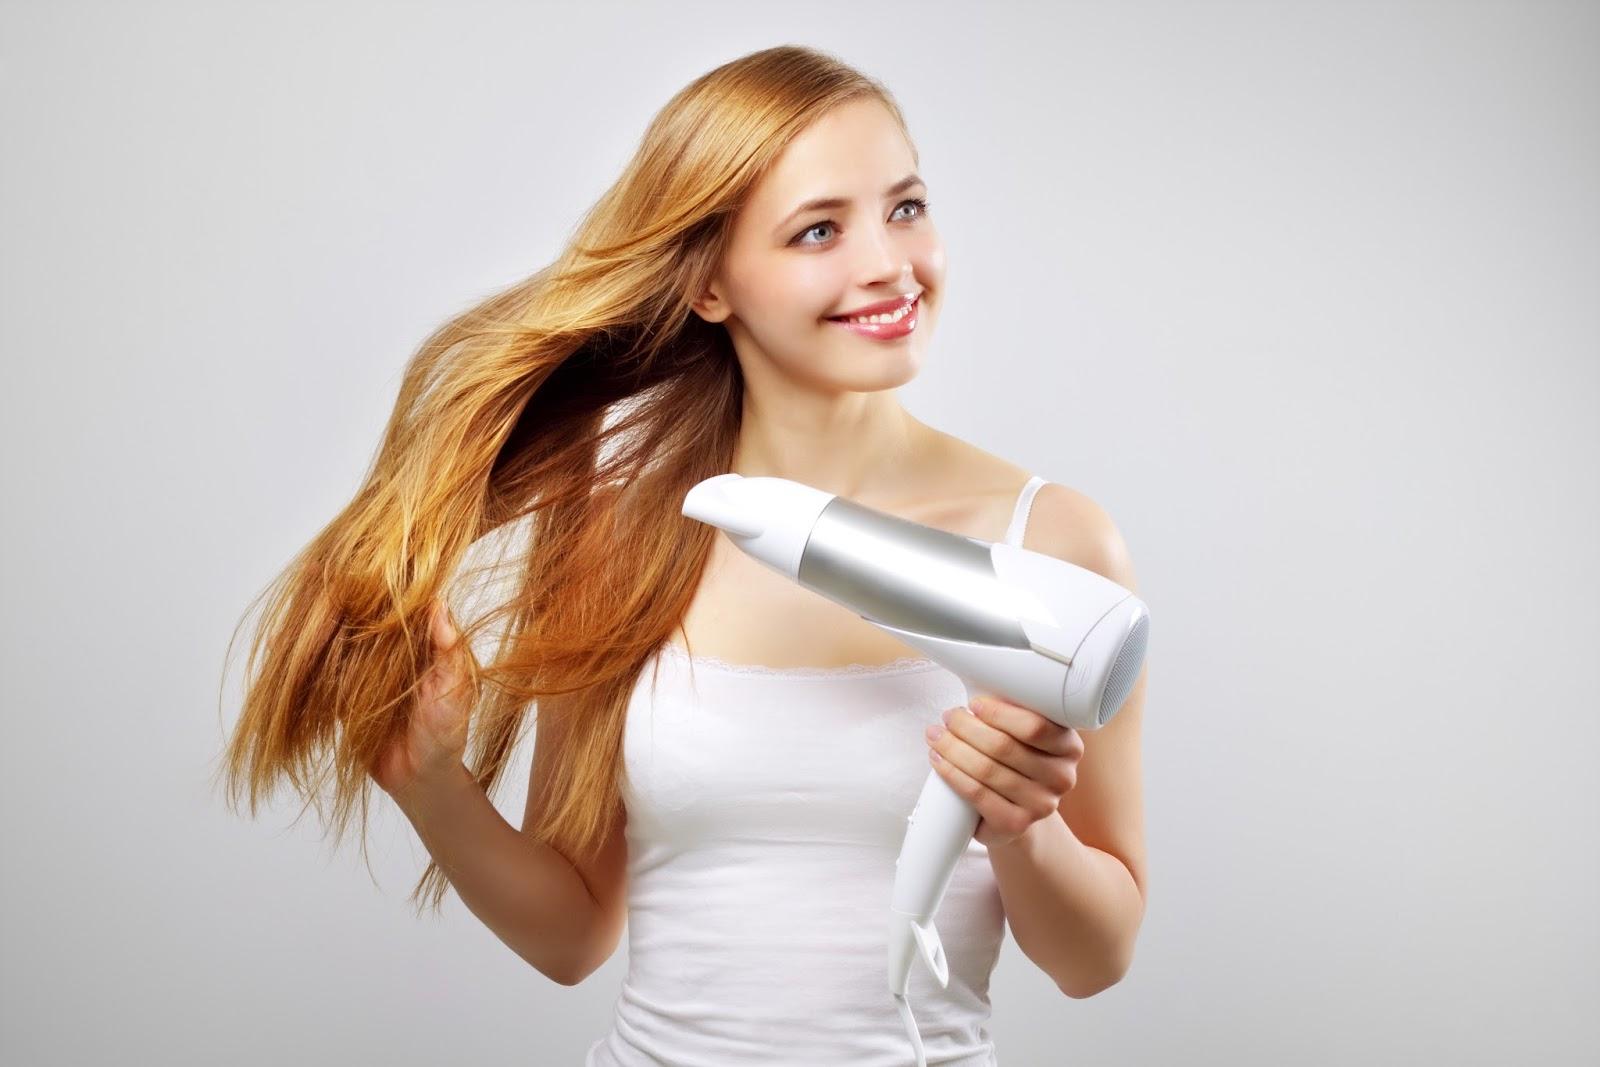 hair-dryer-hair-loss